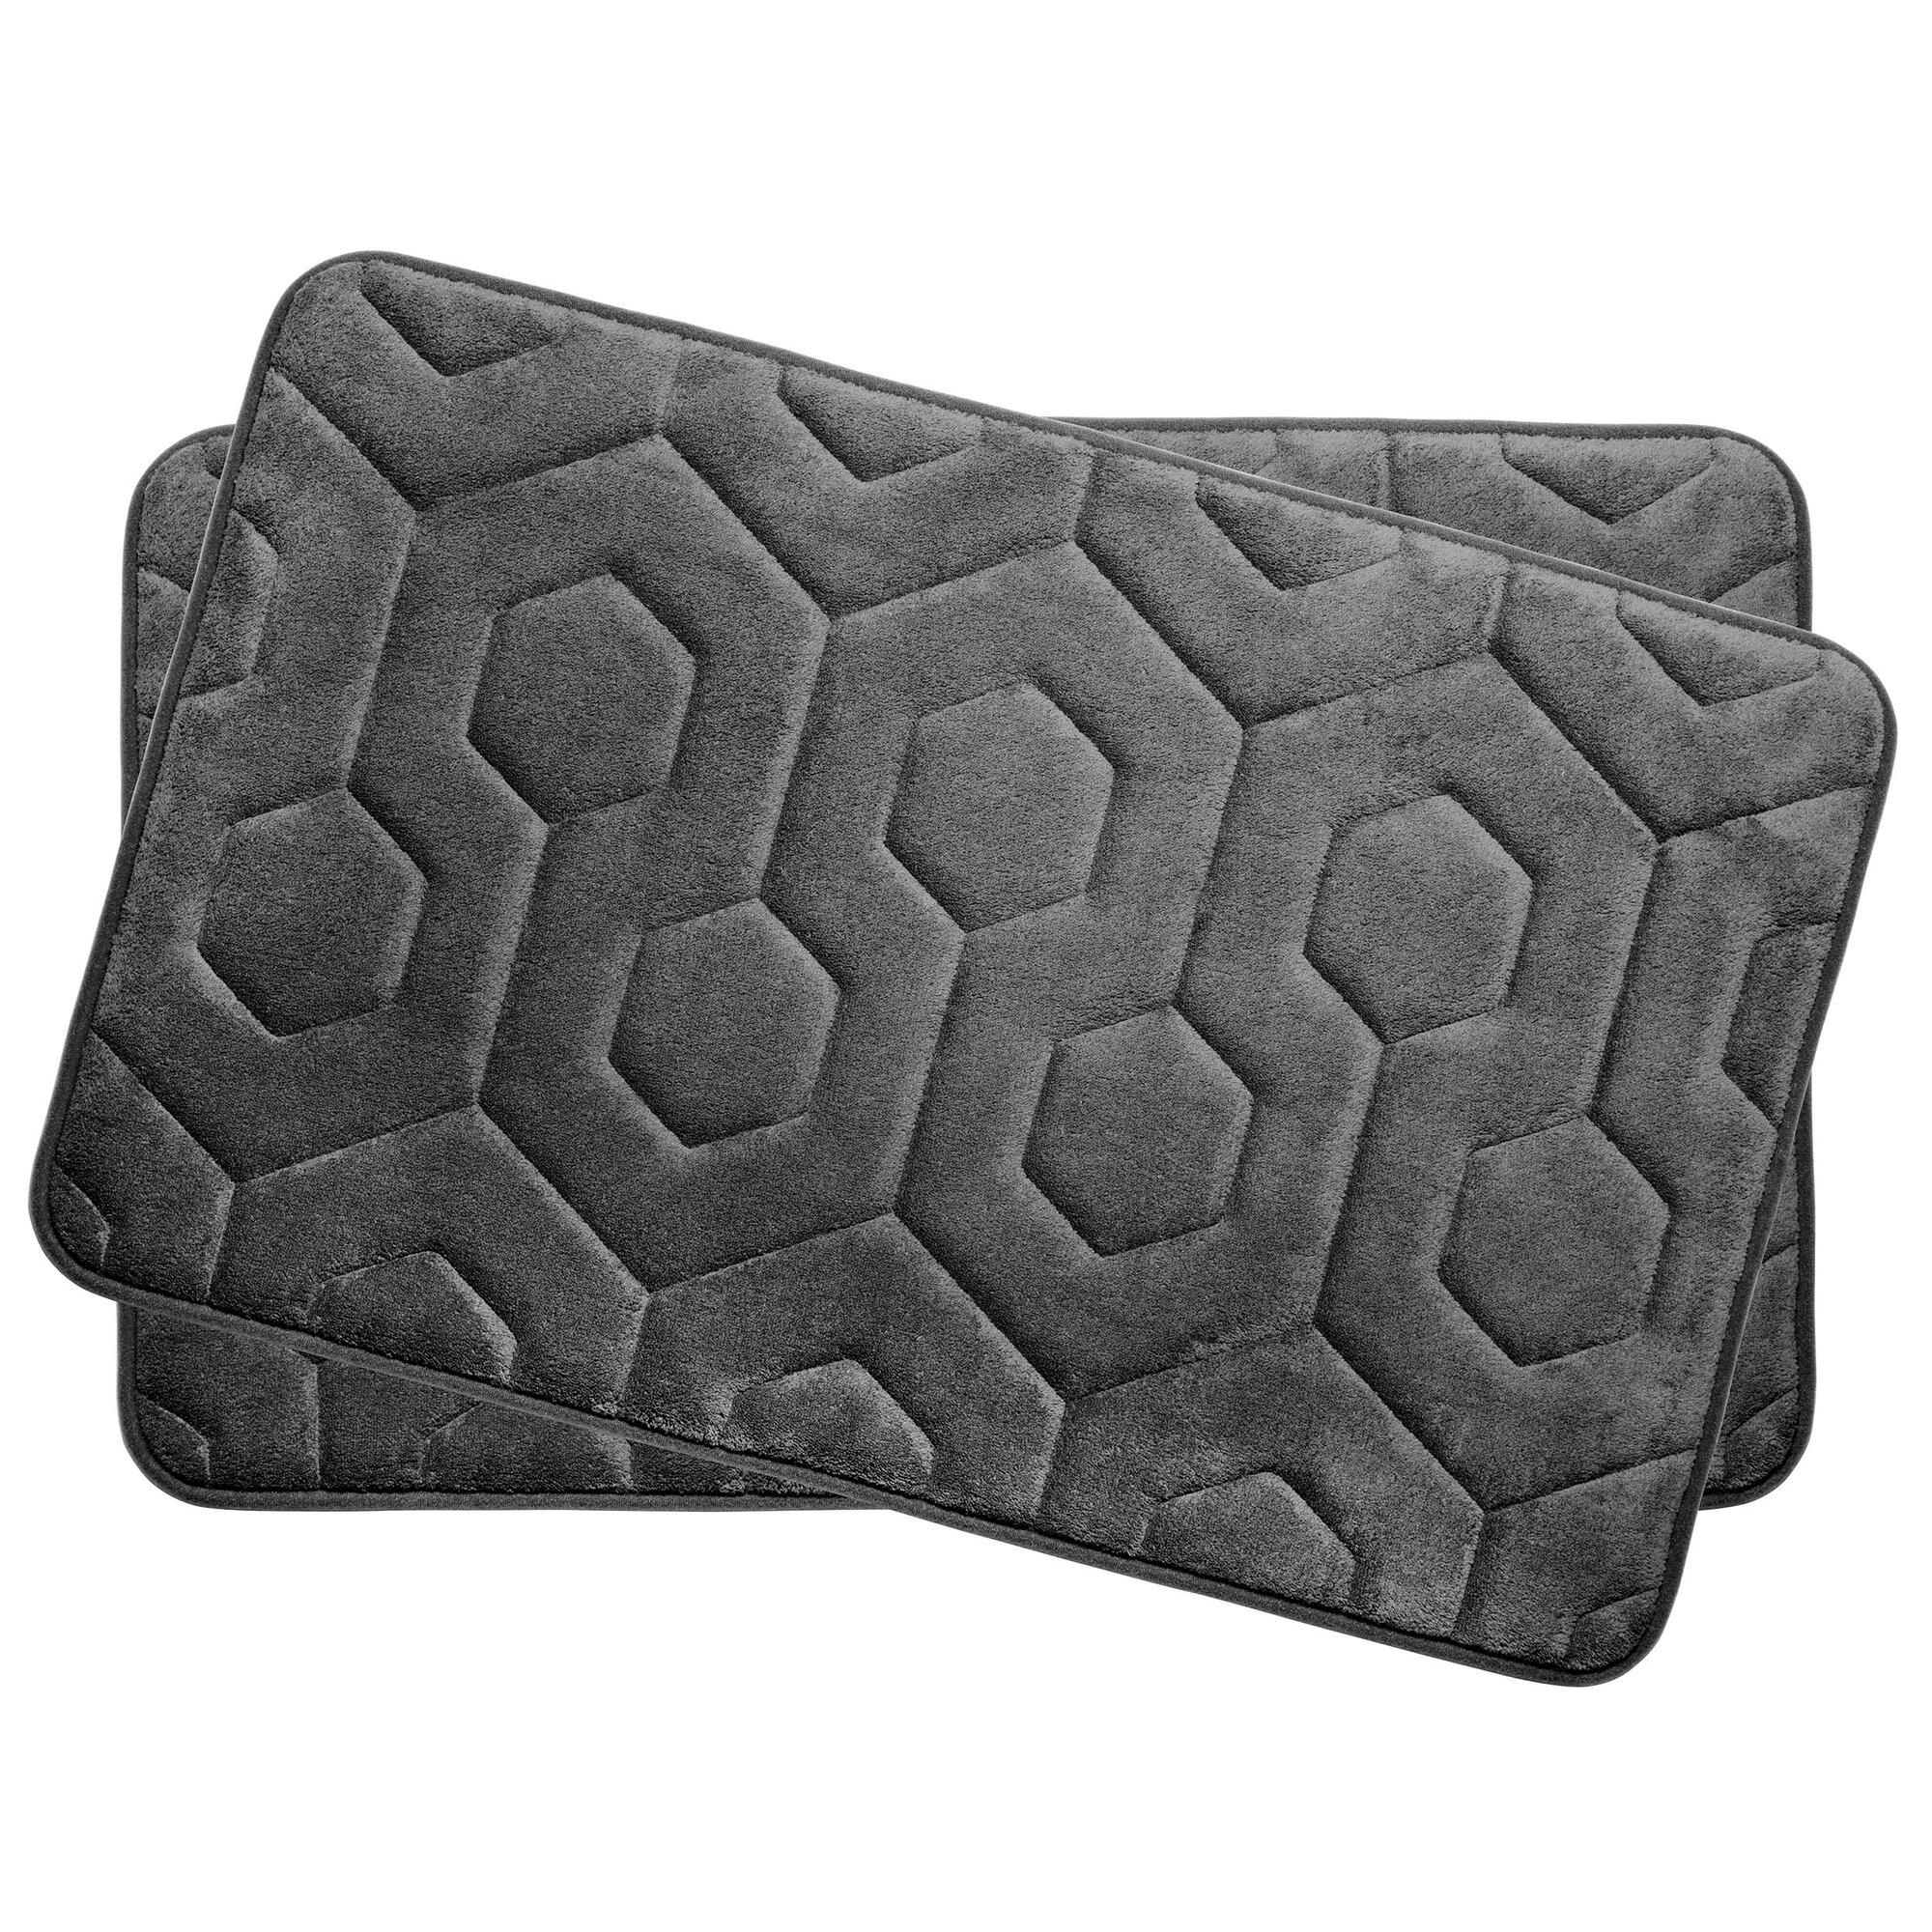 Bath Studio Hexagon Small Plush Memory Foam Bath Mat Color: Dark Grey